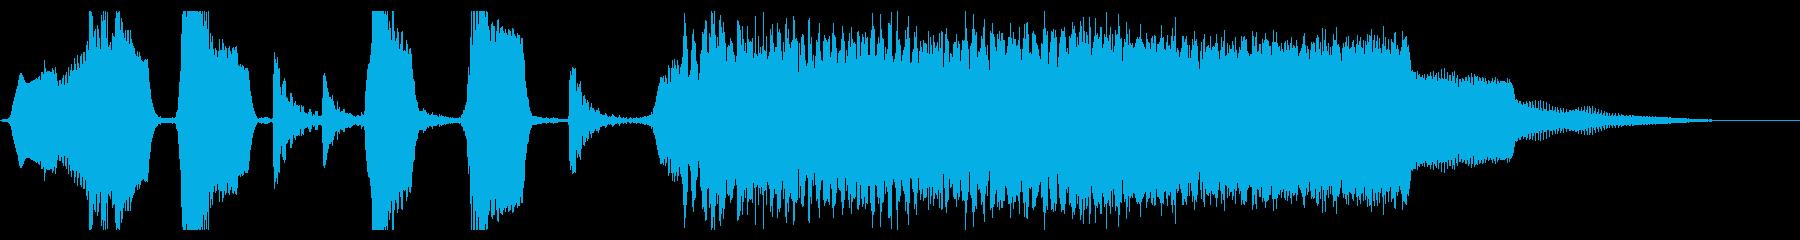 simplenicaの再生済みの波形